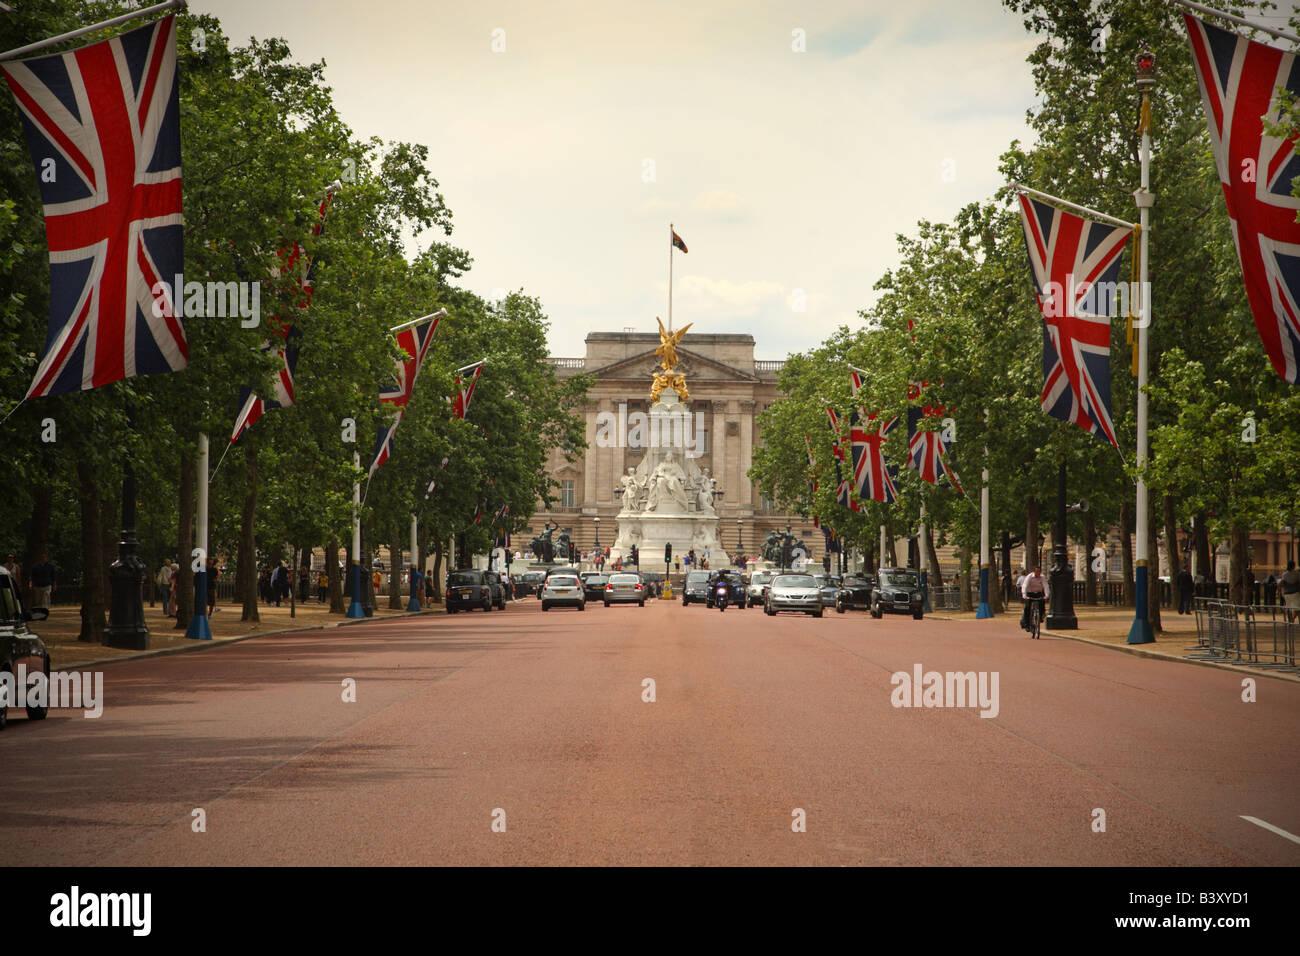 The Mall (road leading to Buckingham Palace), London, England - Stock Image